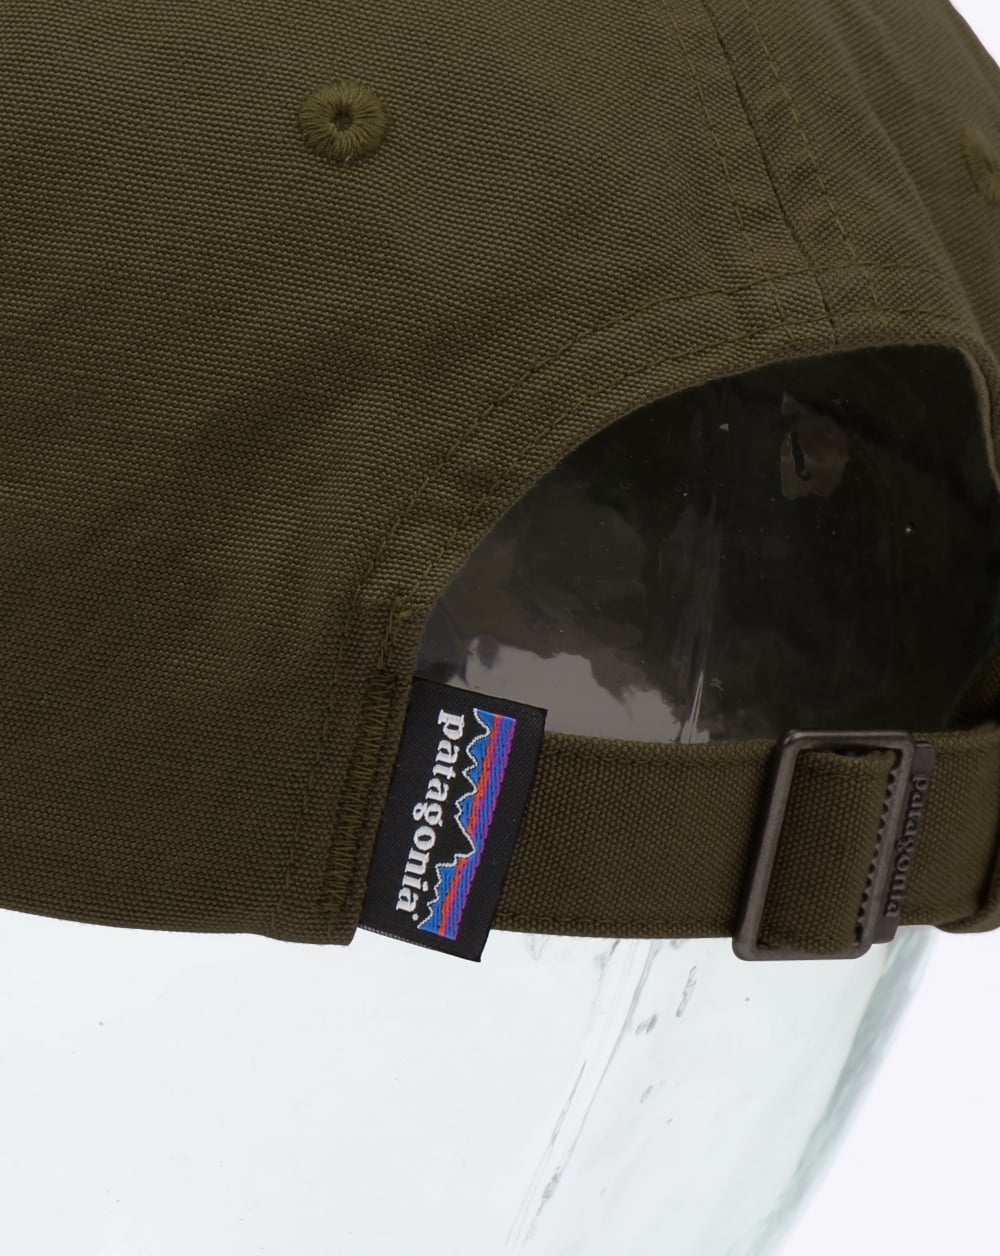 7d842dc9 Patagonia P-6 Label Trad Cap Dark Ash - Hats And Caps from 80s ...